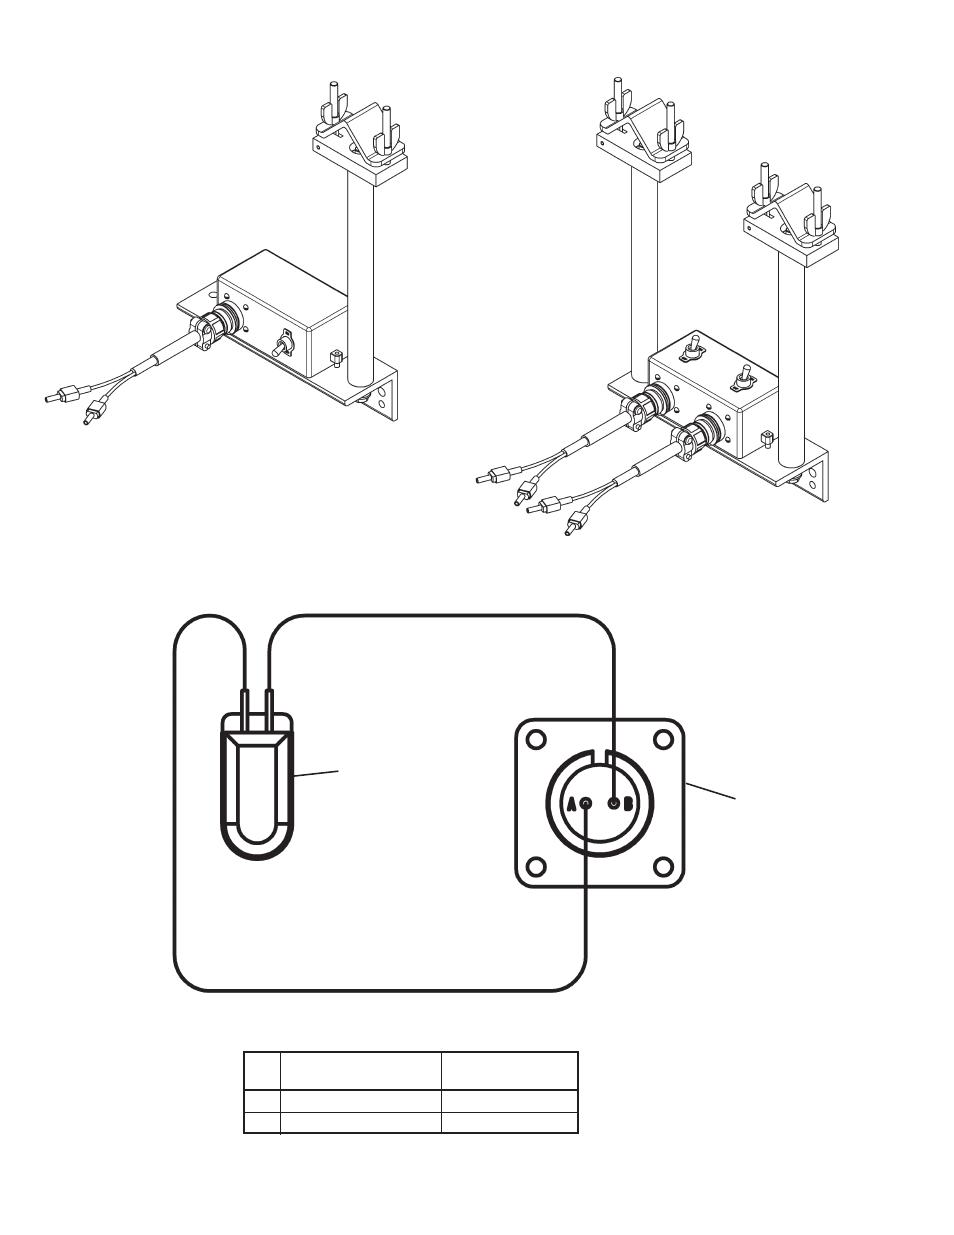 Accessories cont'd, Bug-5485 contactor / wiring diagram